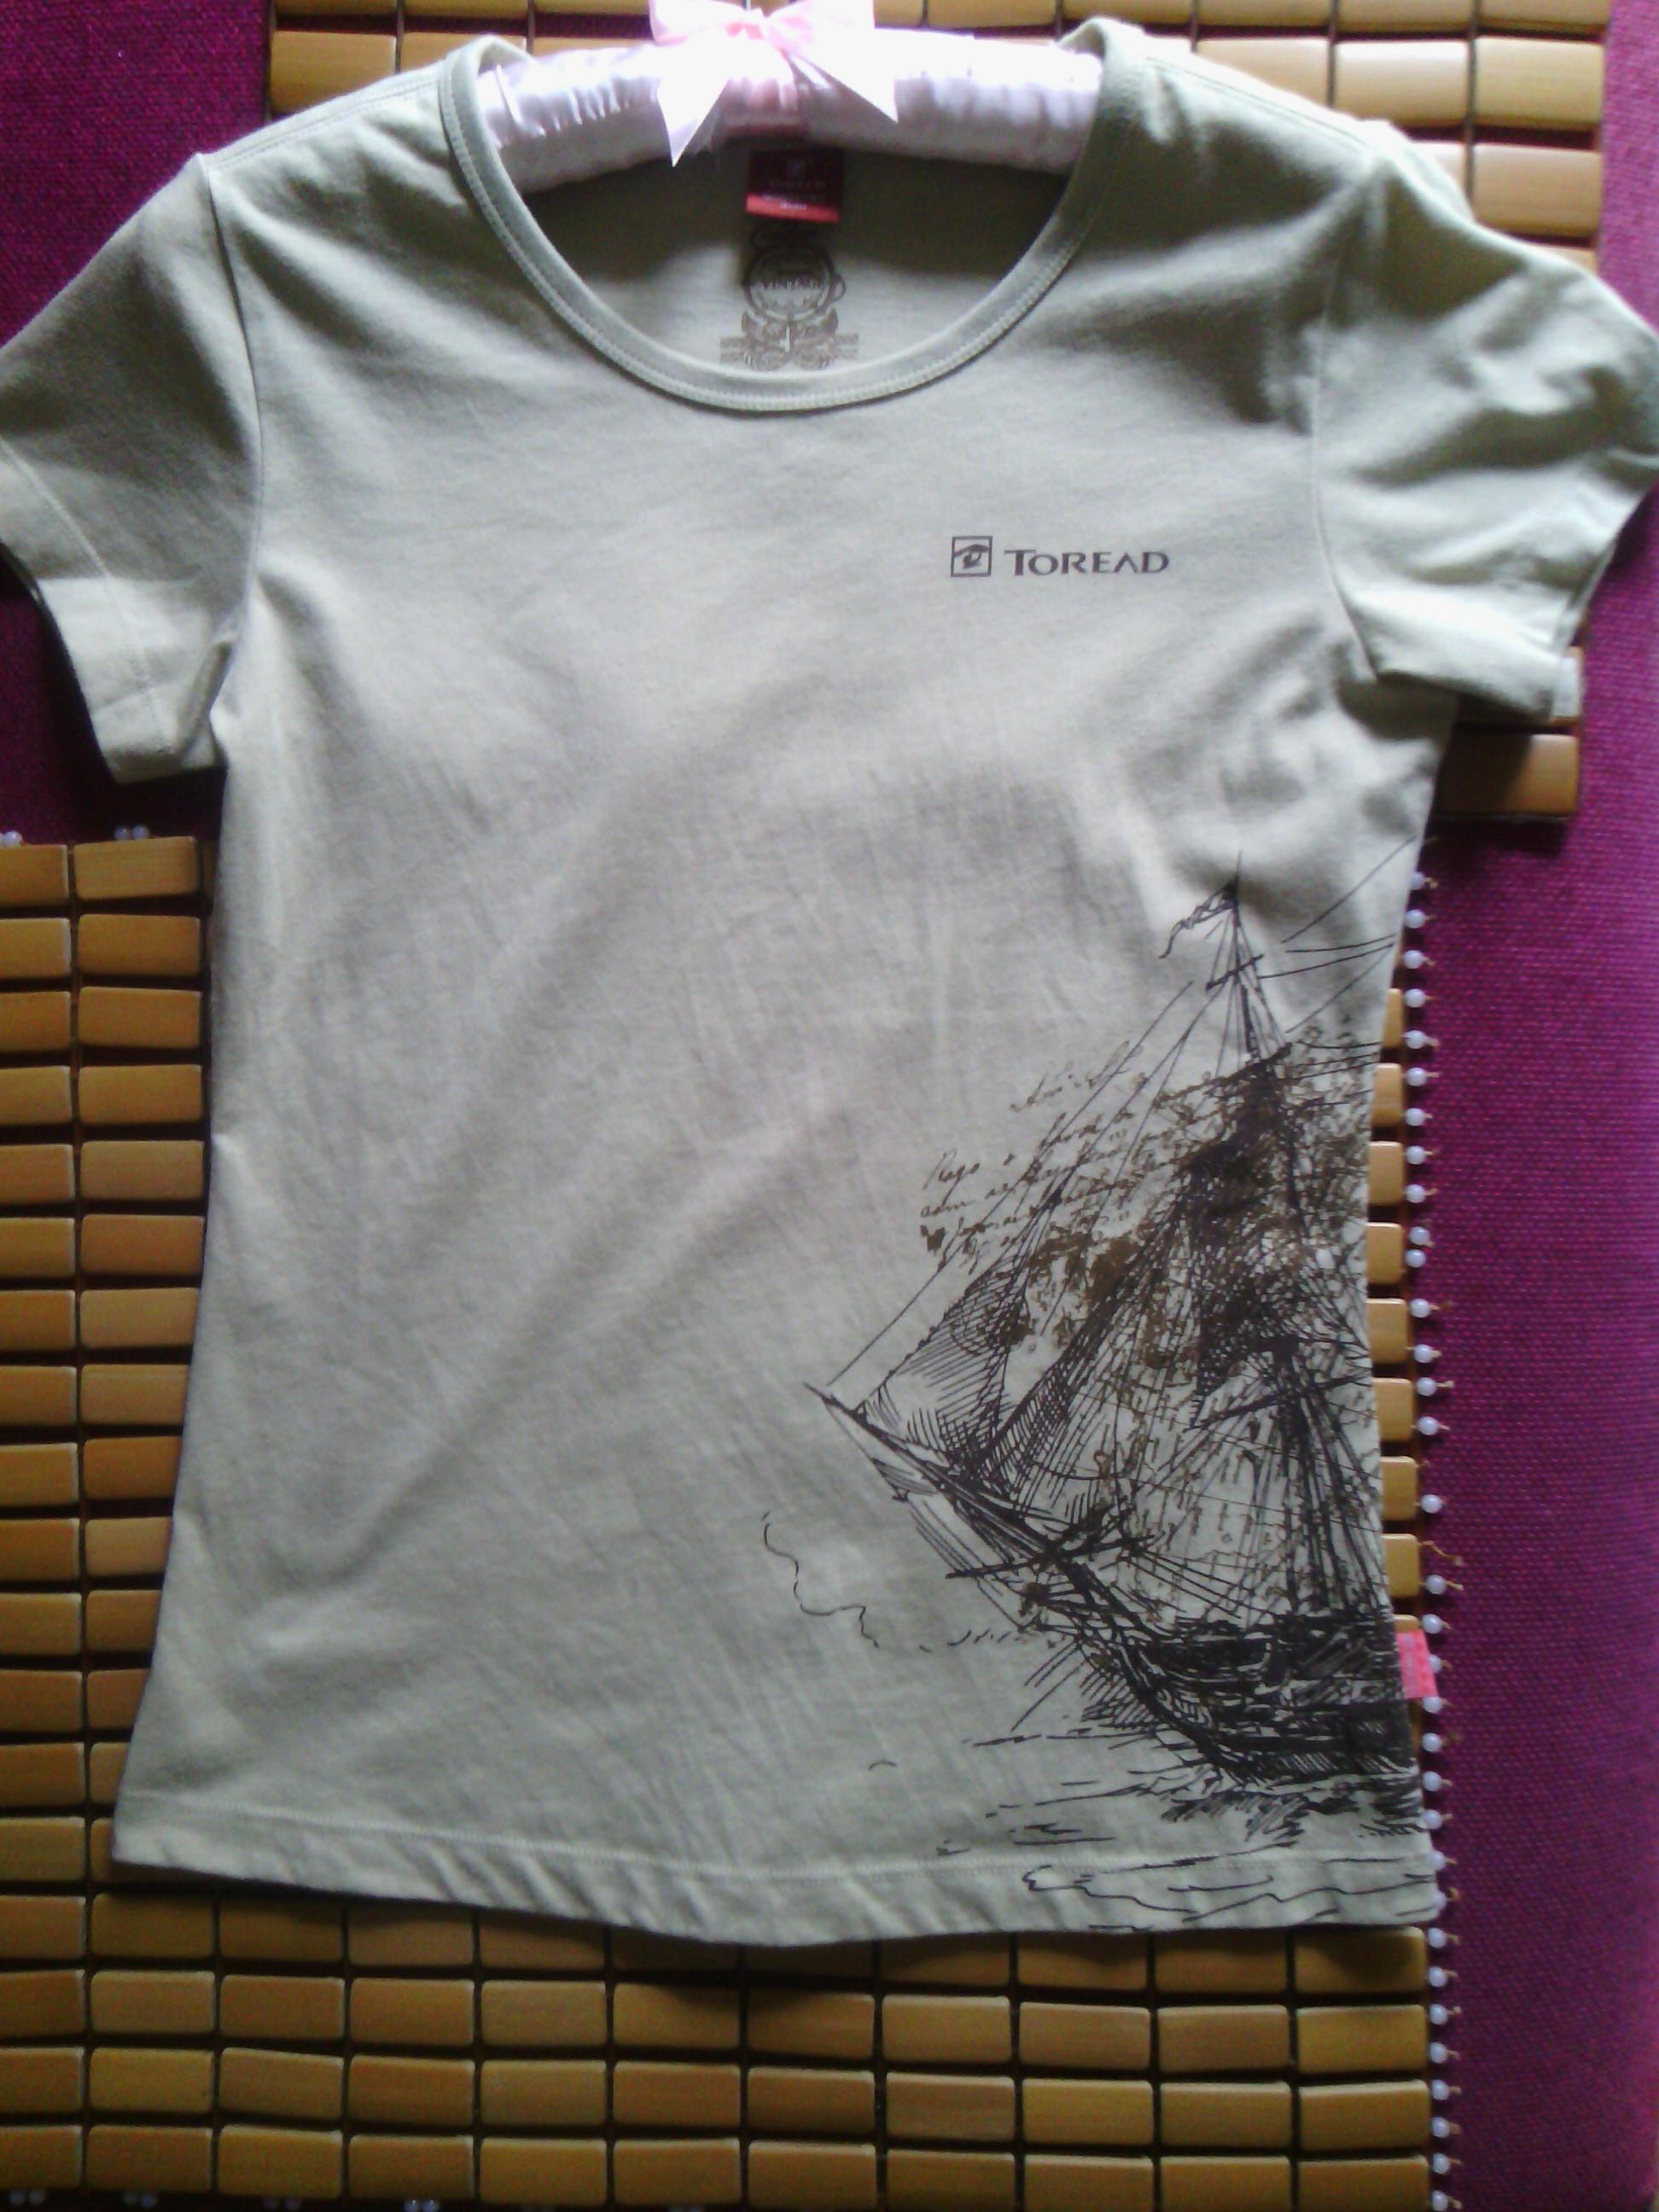 shop clothes online philippines 00213257 store